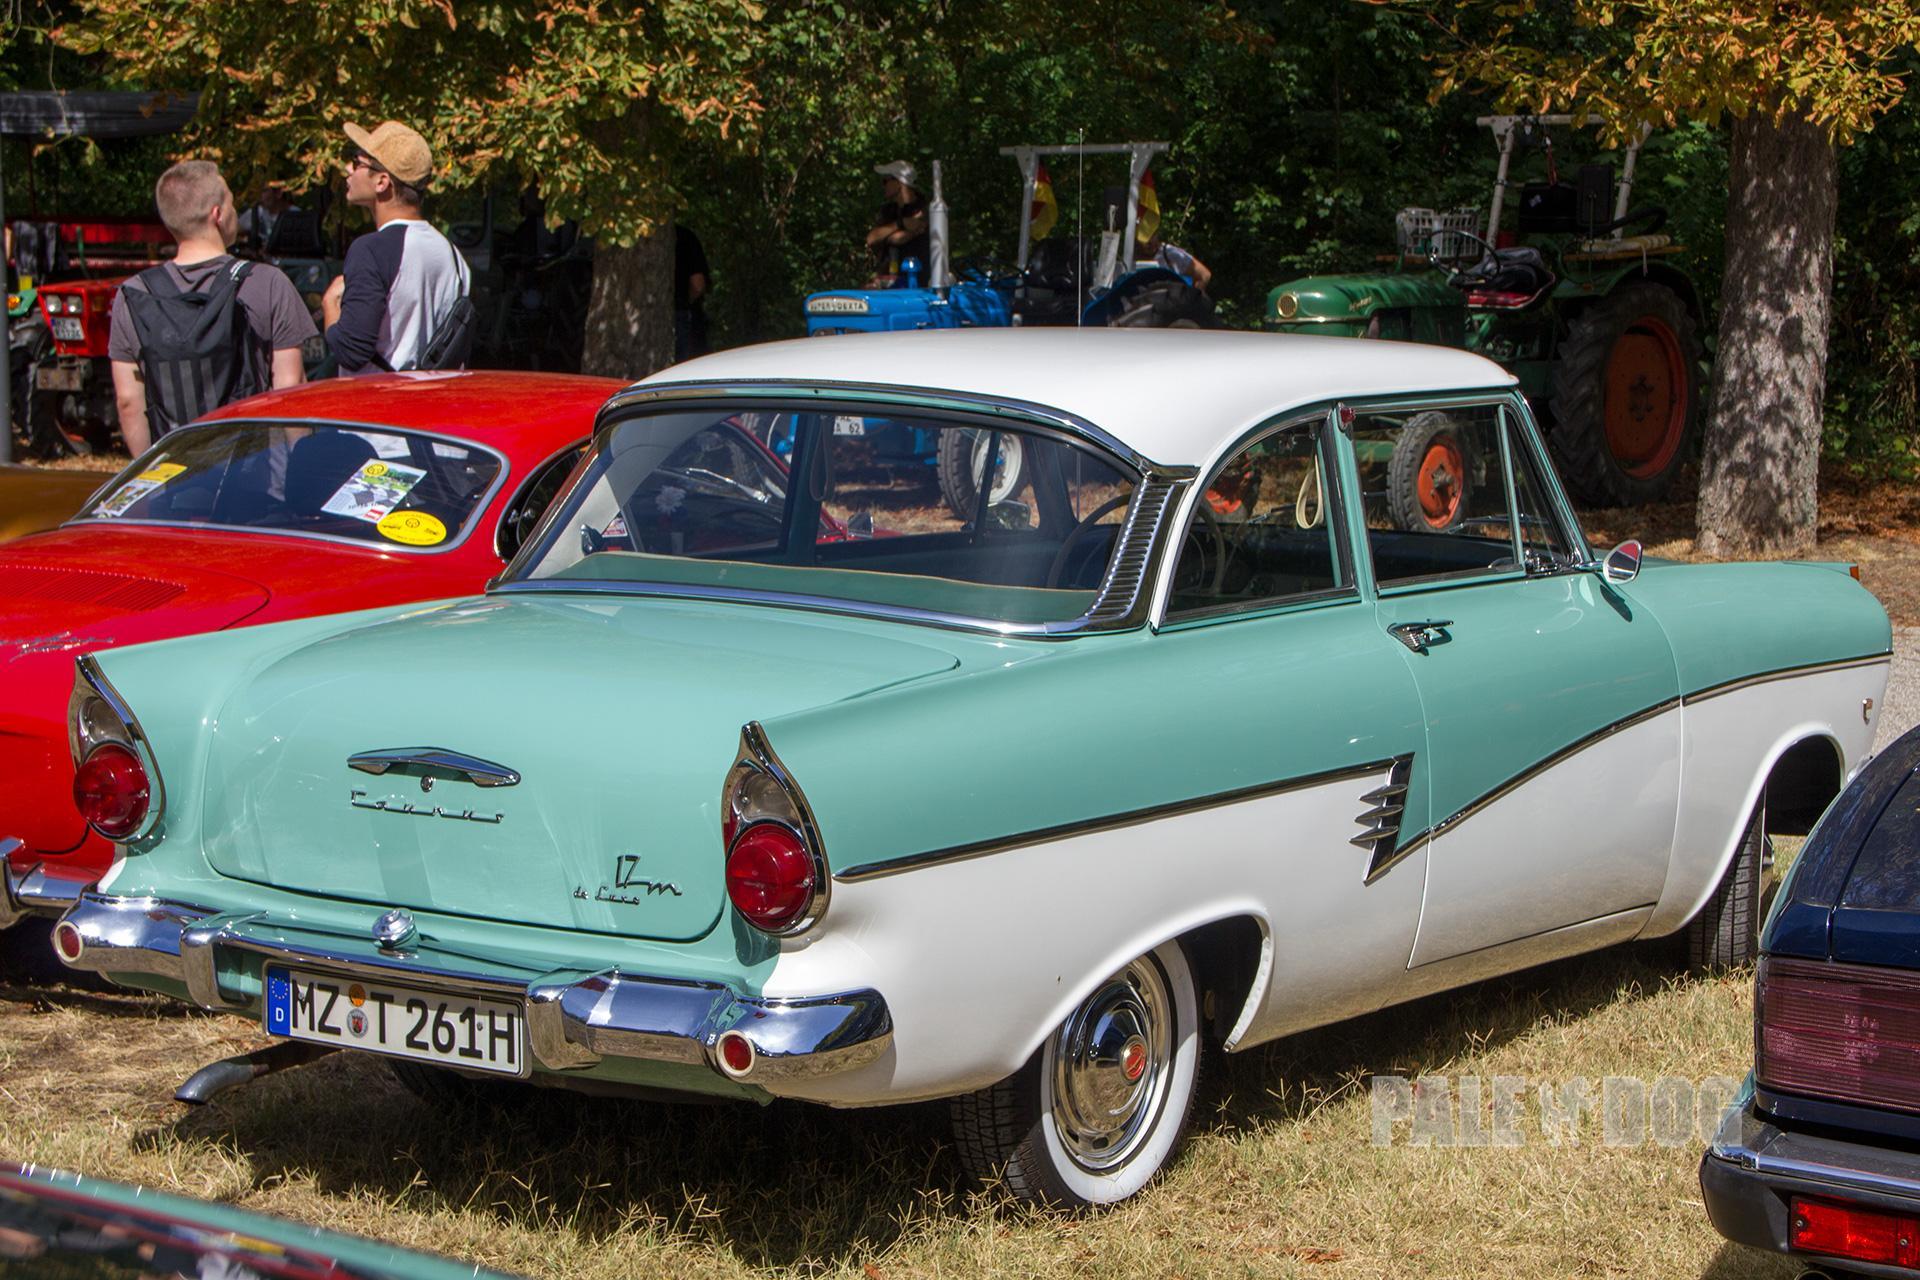 1960 ford taunus 17m de luxe p2 rear view post war. Black Bedroom Furniture Sets. Home Design Ideas